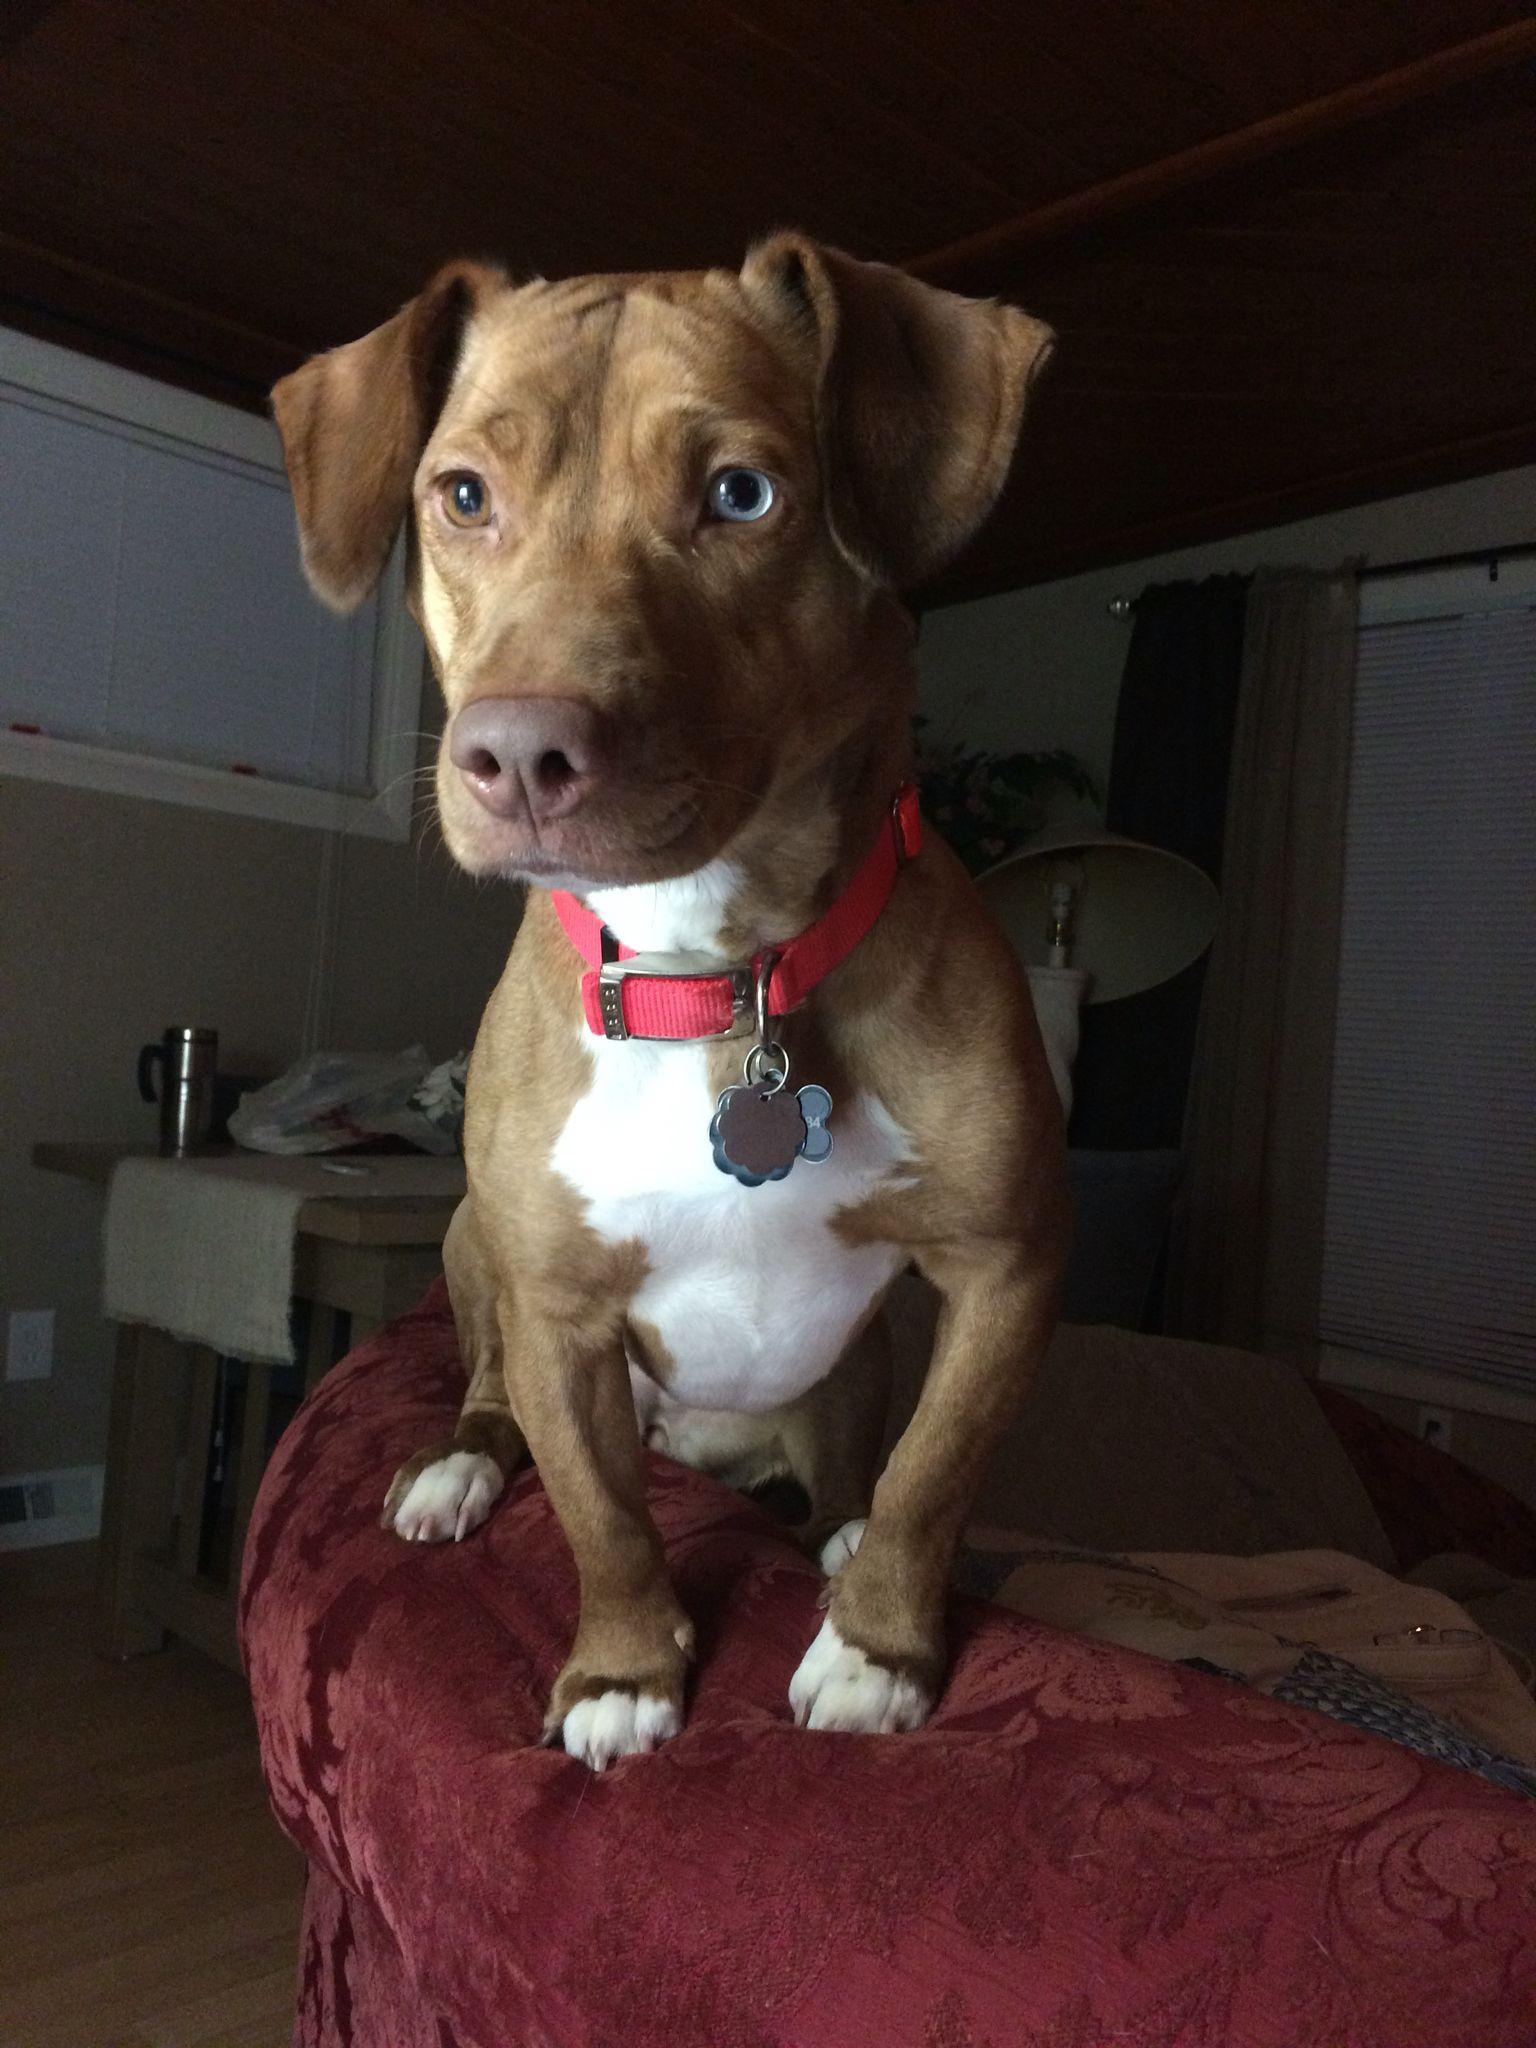 Pitbull Dachshund Named Lucy Adopt Don T Shop Pitbulls